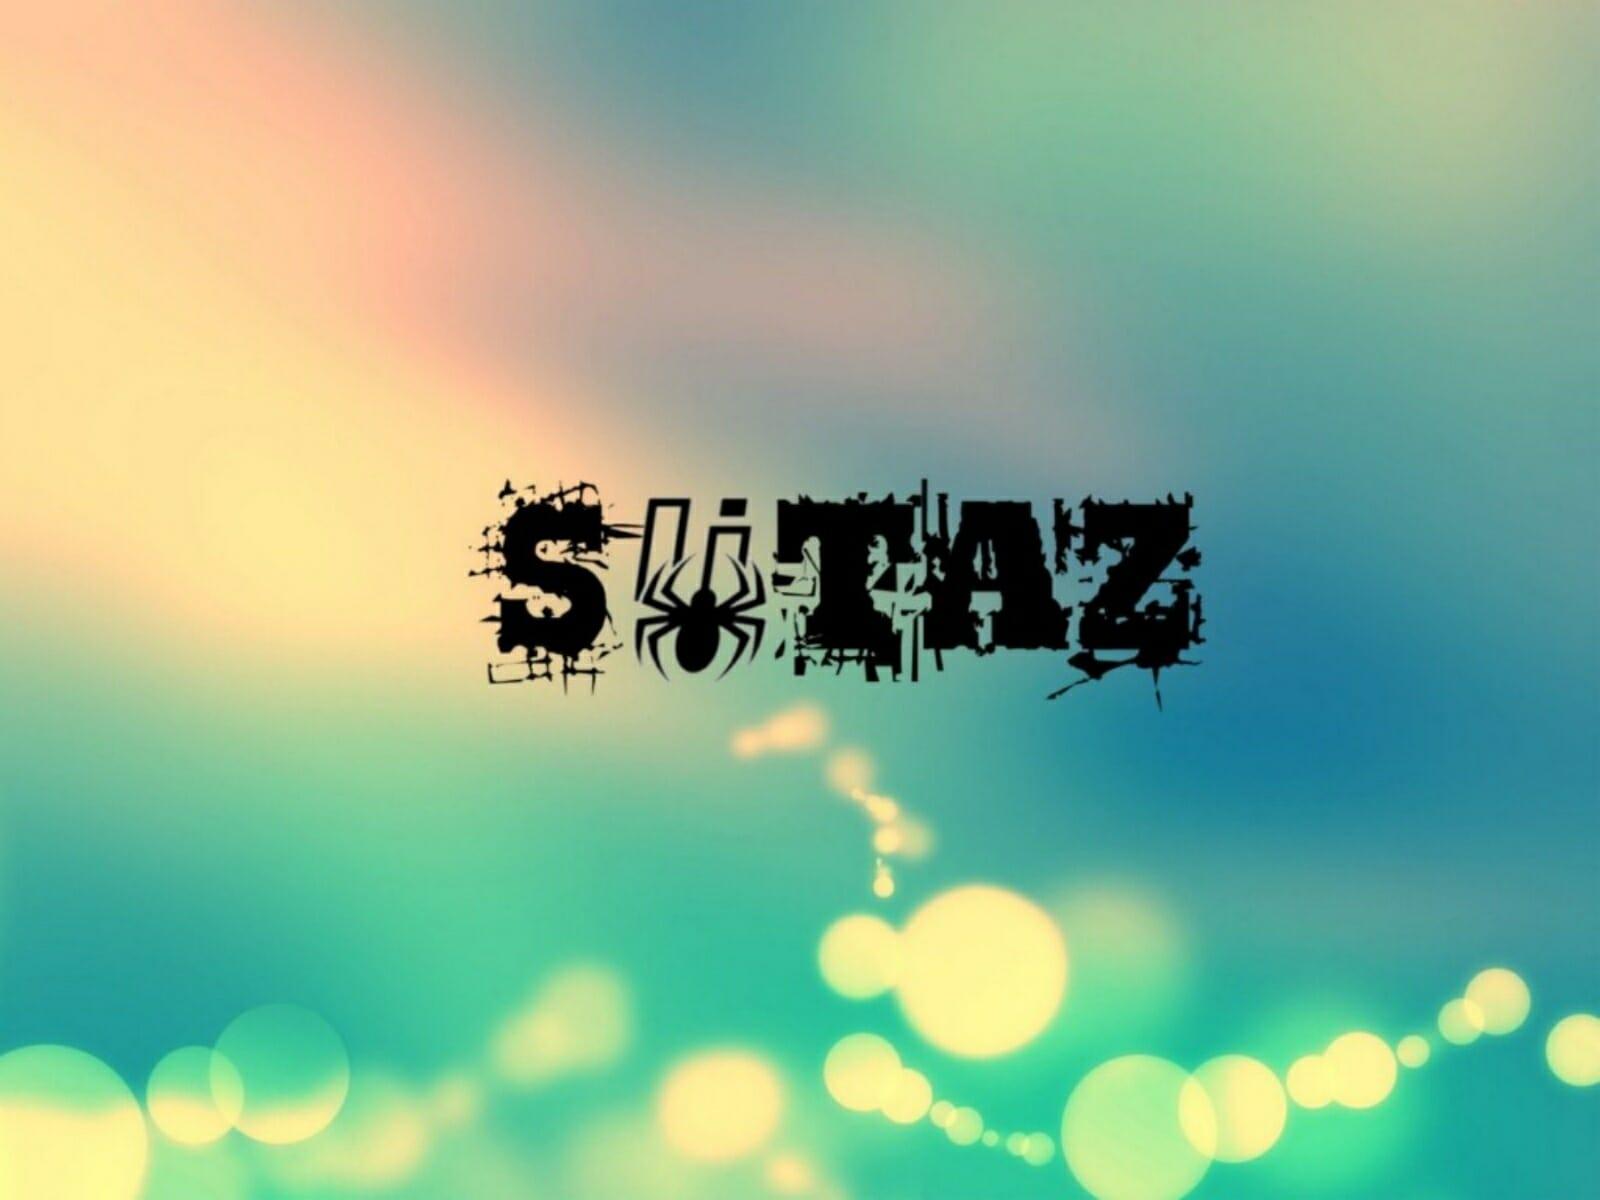 slitaz_wallpapers_fondo de pantalla